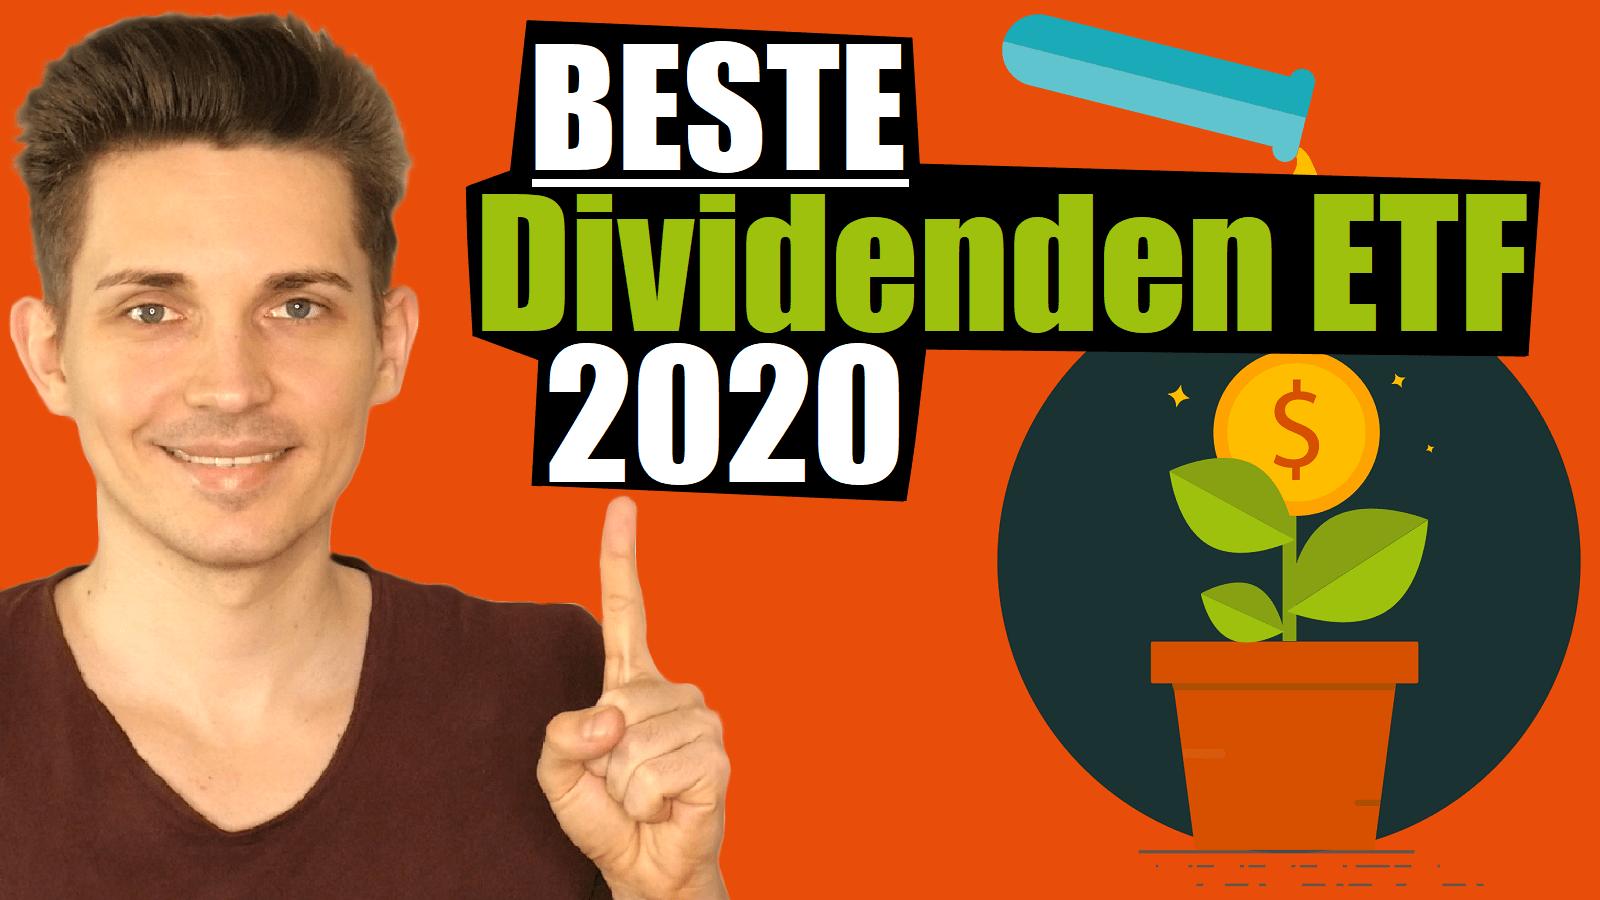 beste Dividenden ETF